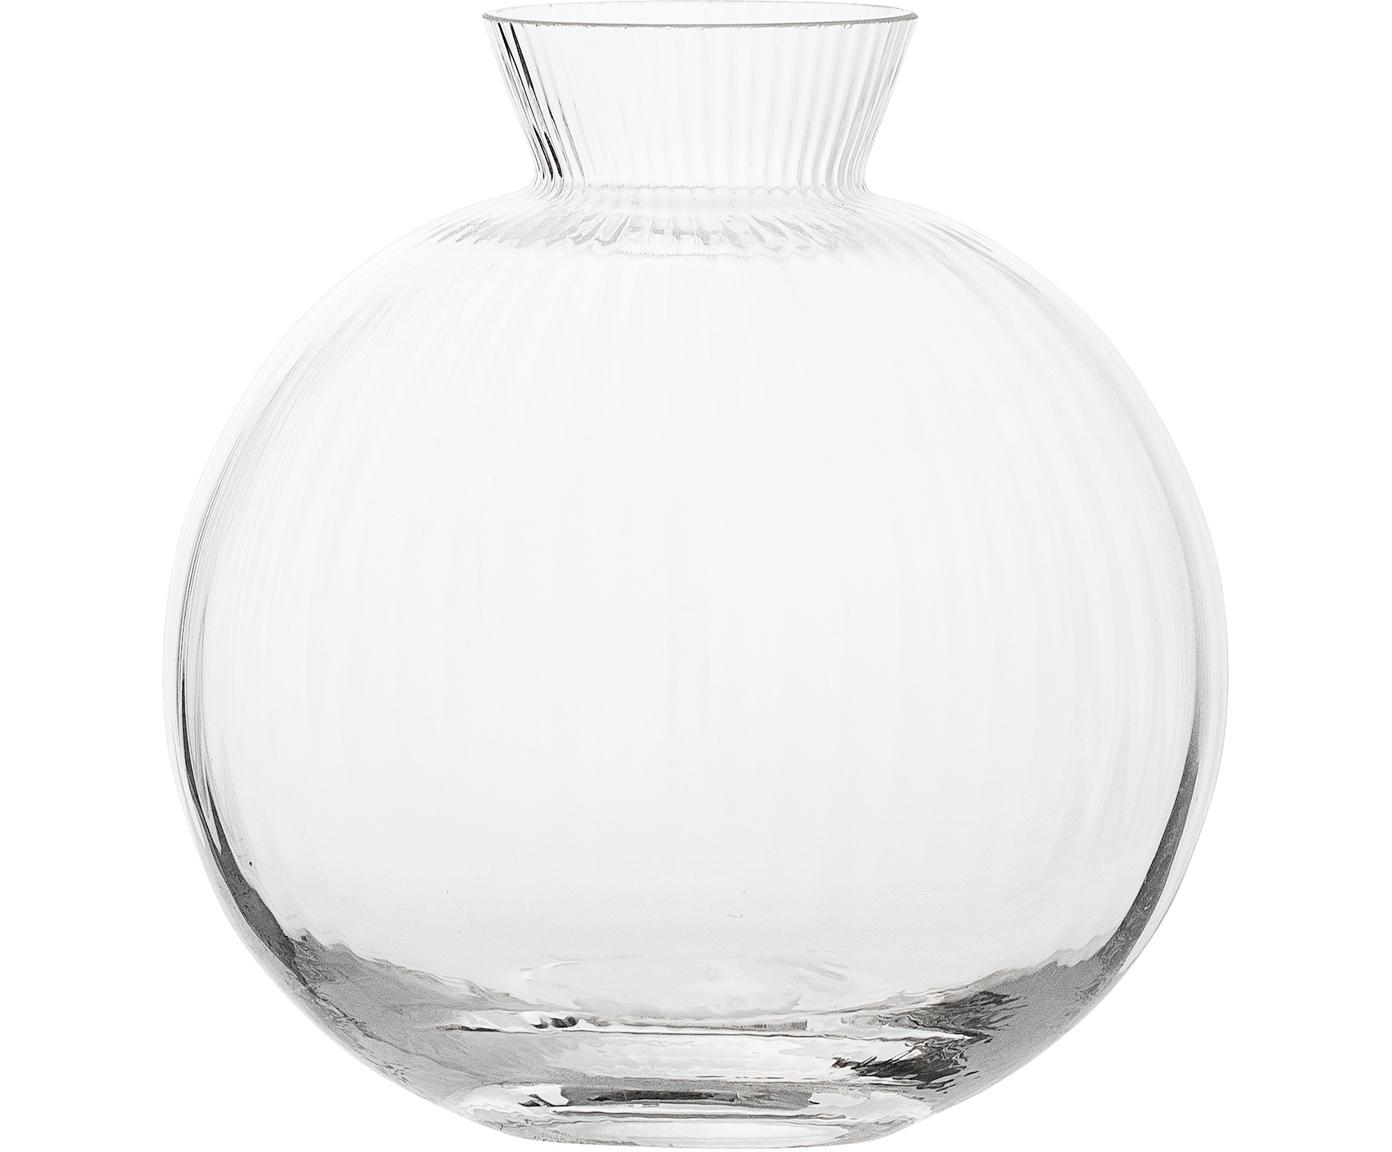 Vaas Visible, Glas, Transparant, Ø 11 x H 12 cm